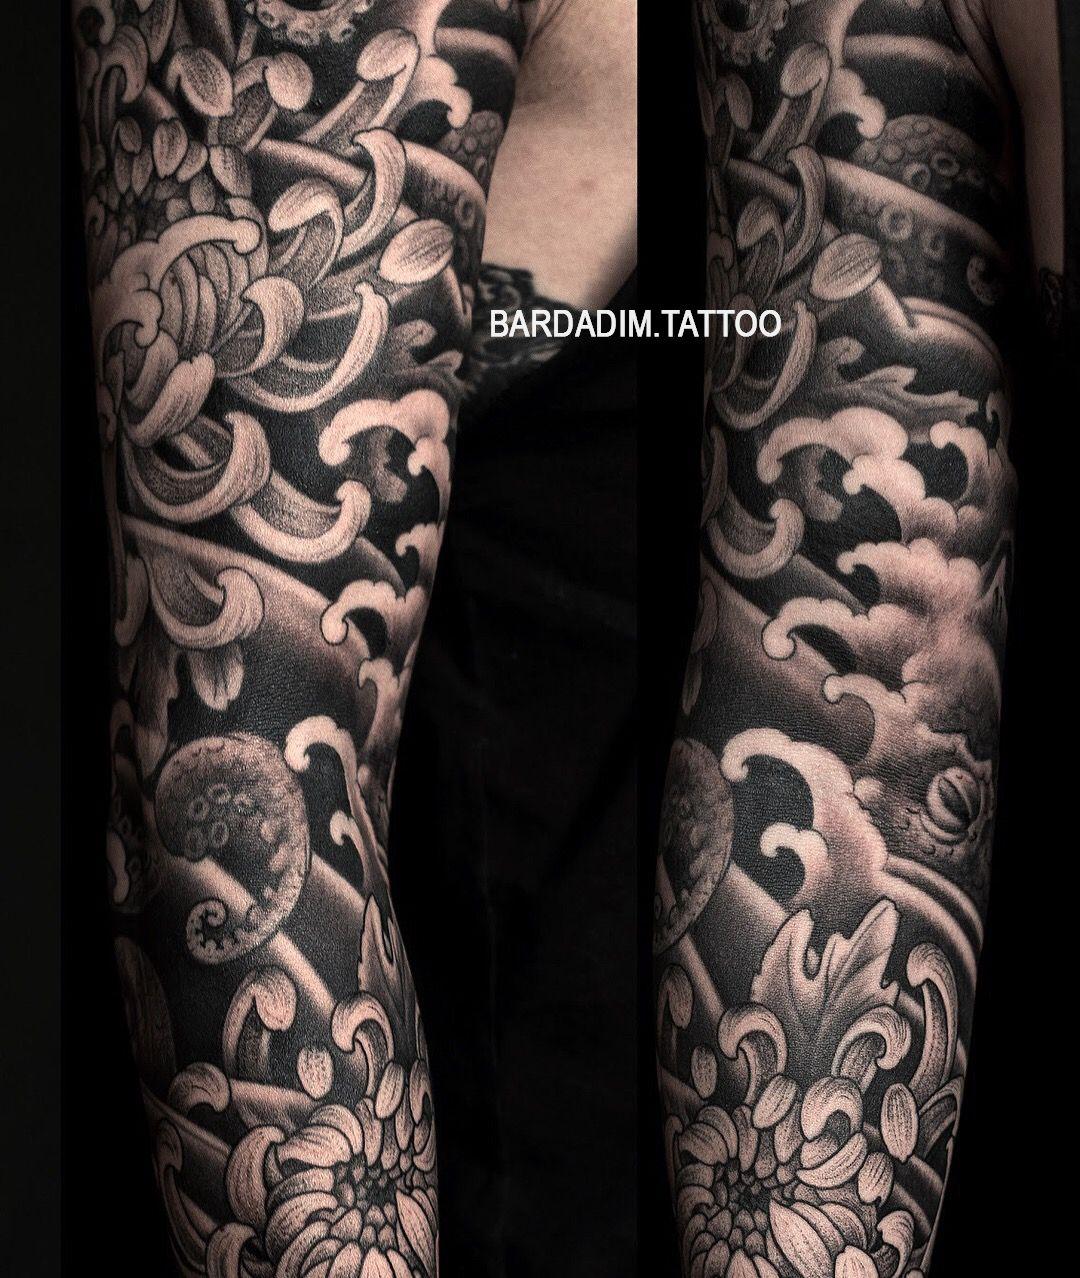 Octopus Japanese Tattoo George Bardadim Tattoo Artist Nyc Japanese Tattoo Black And Grey Tattoos Grey Tattoo